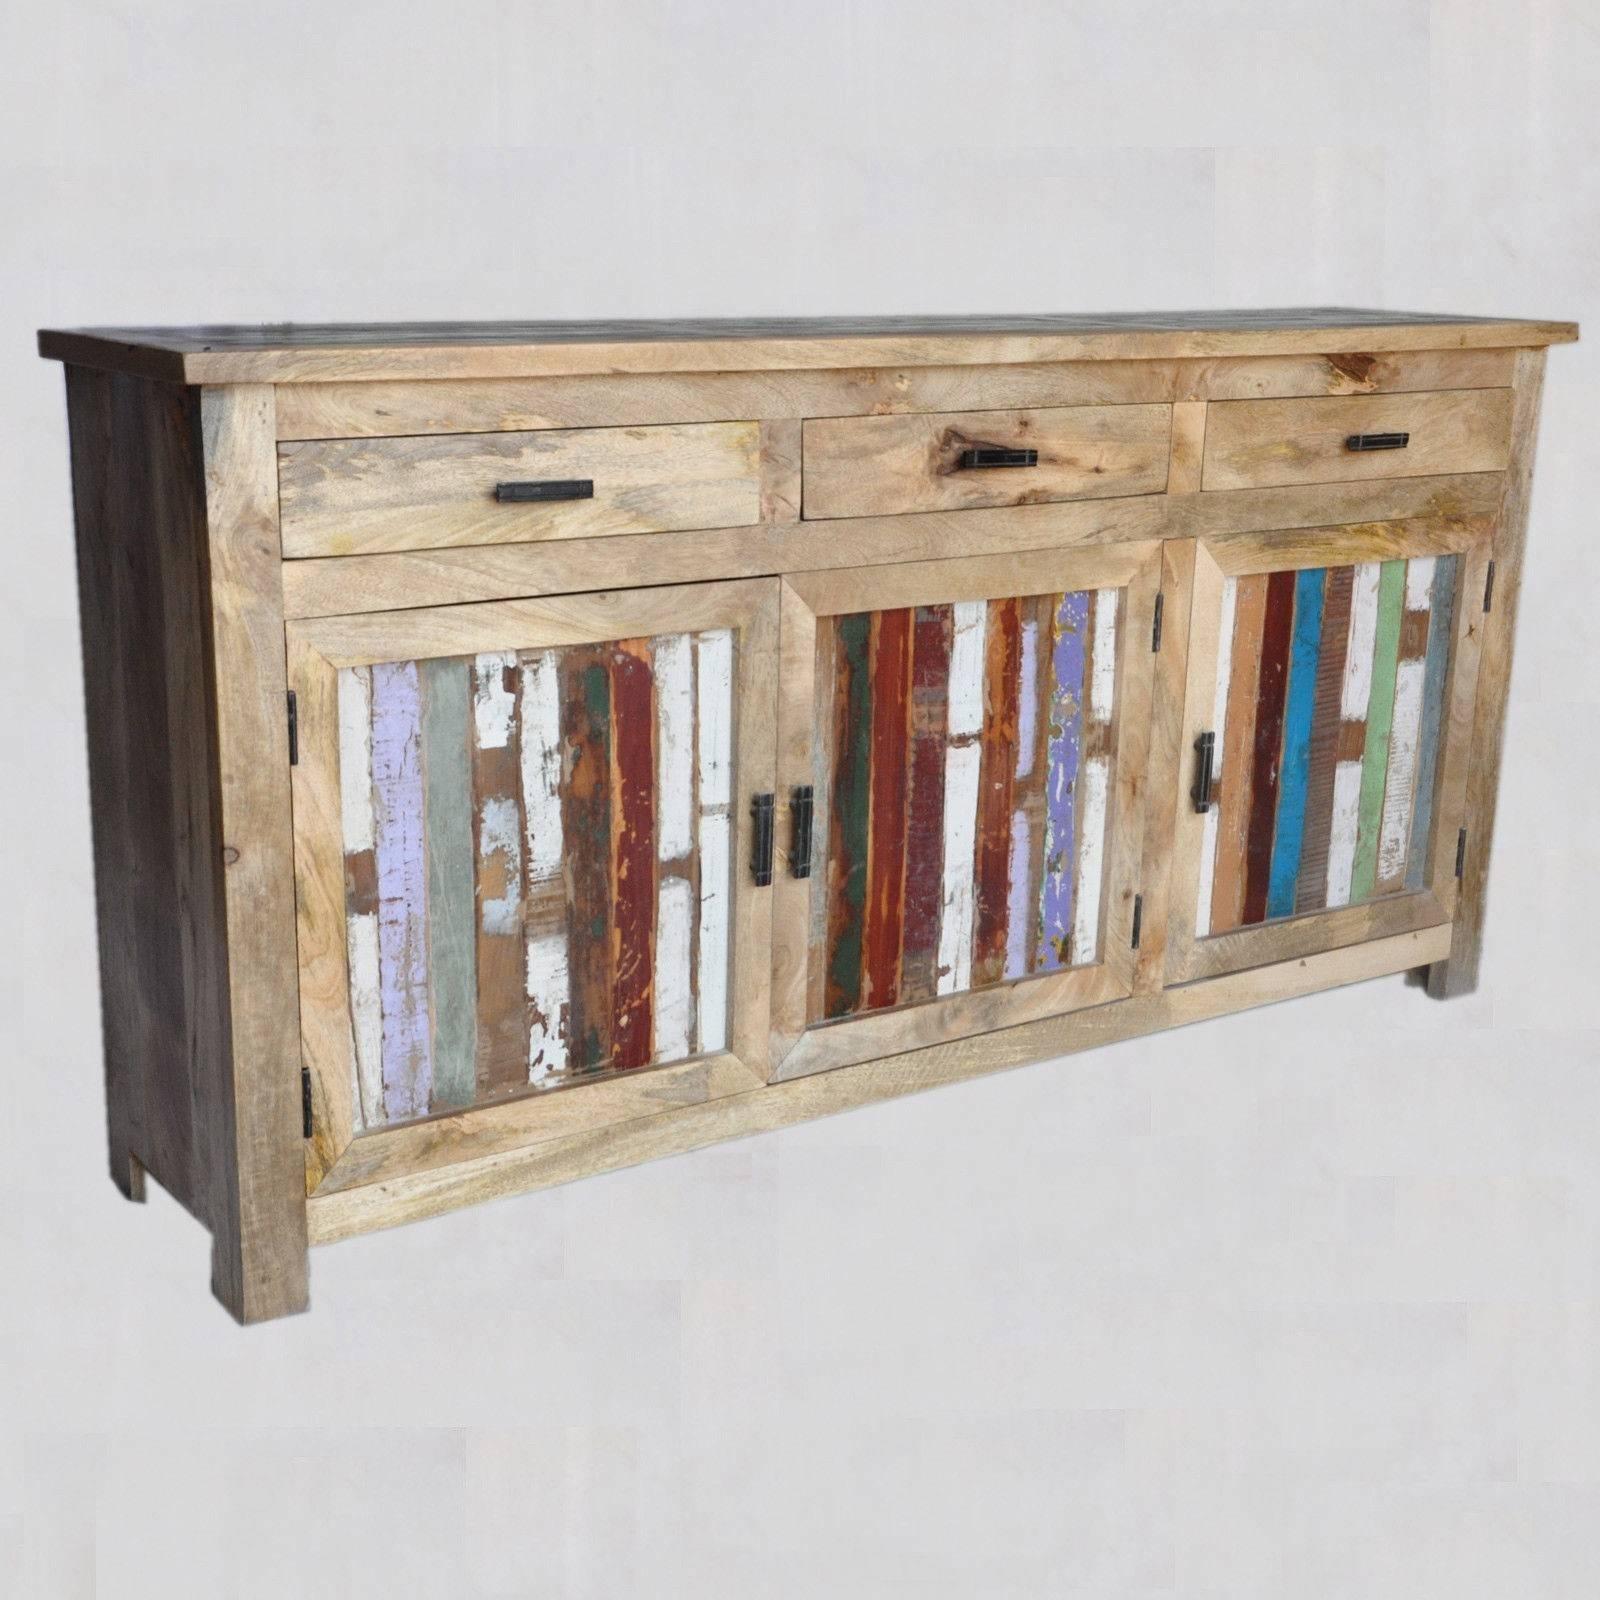 Reclaimed Wood Sideboard inside Reclaimed Wood Sideboards (Image 11 of 15)